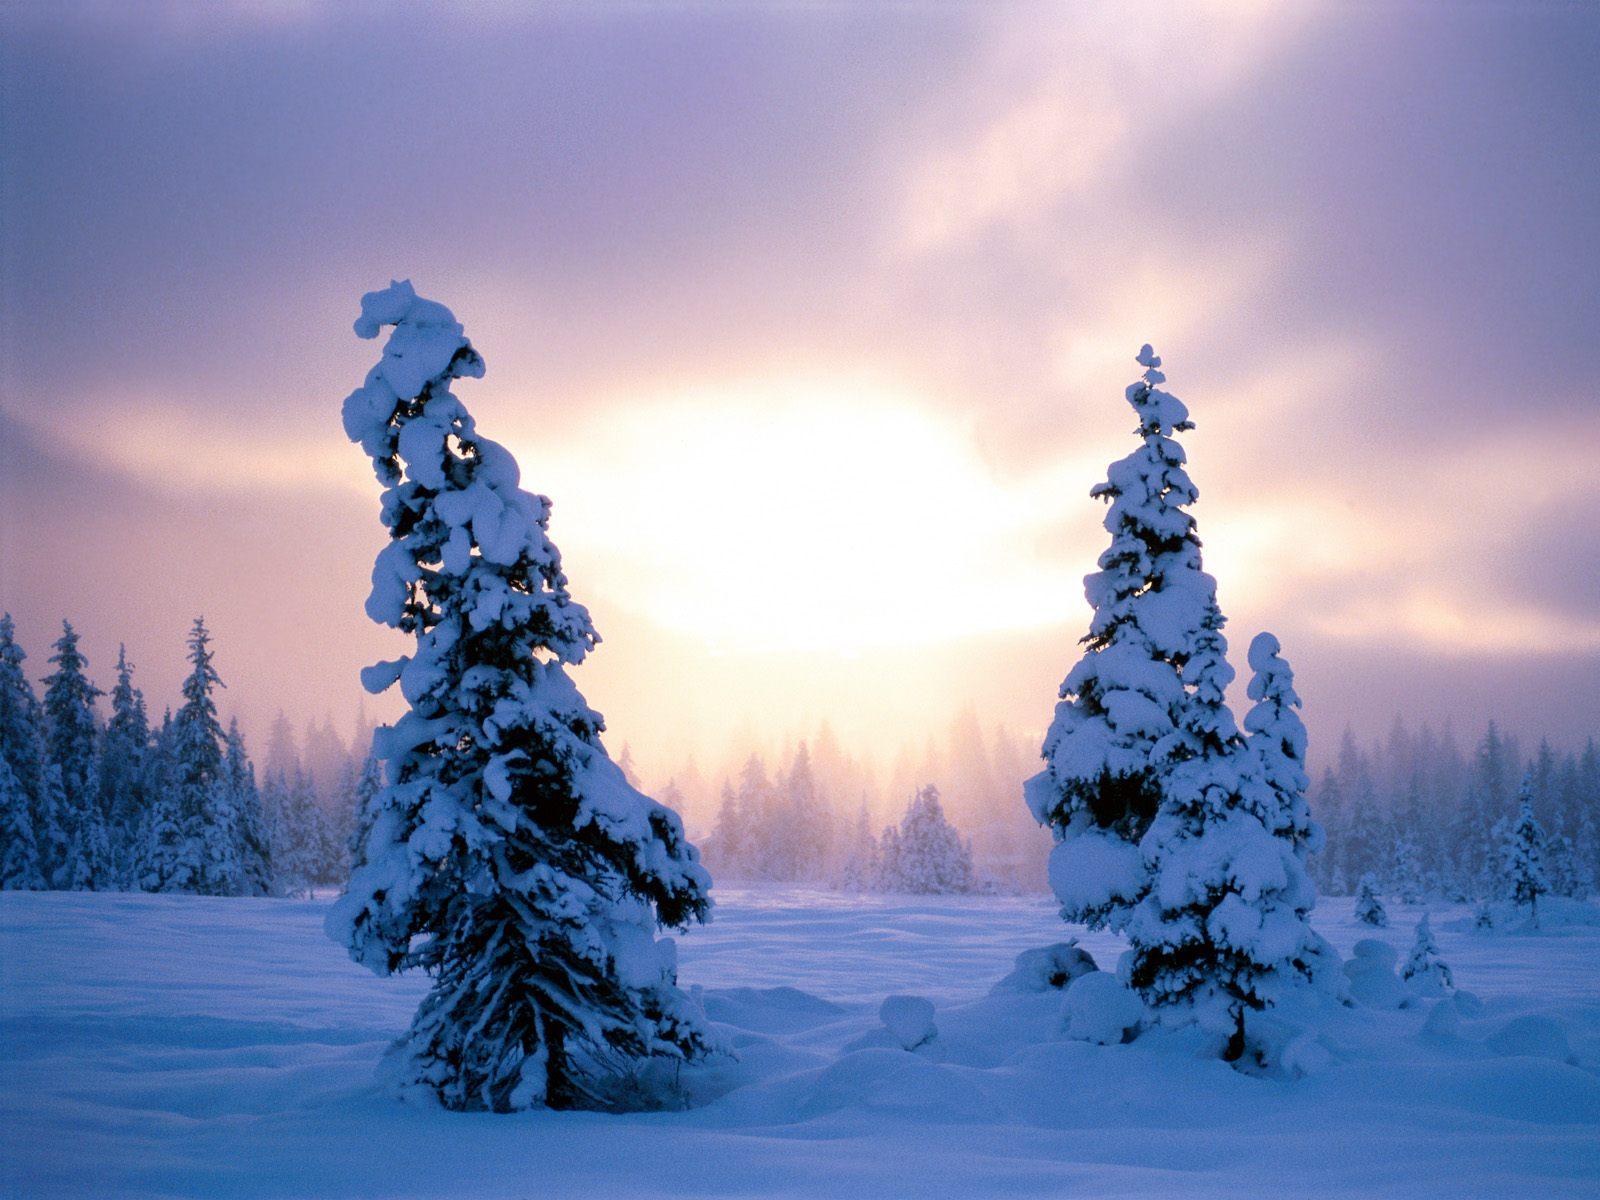 Winter Wallpaper Images of Winter For Your Desktop 1600x1200